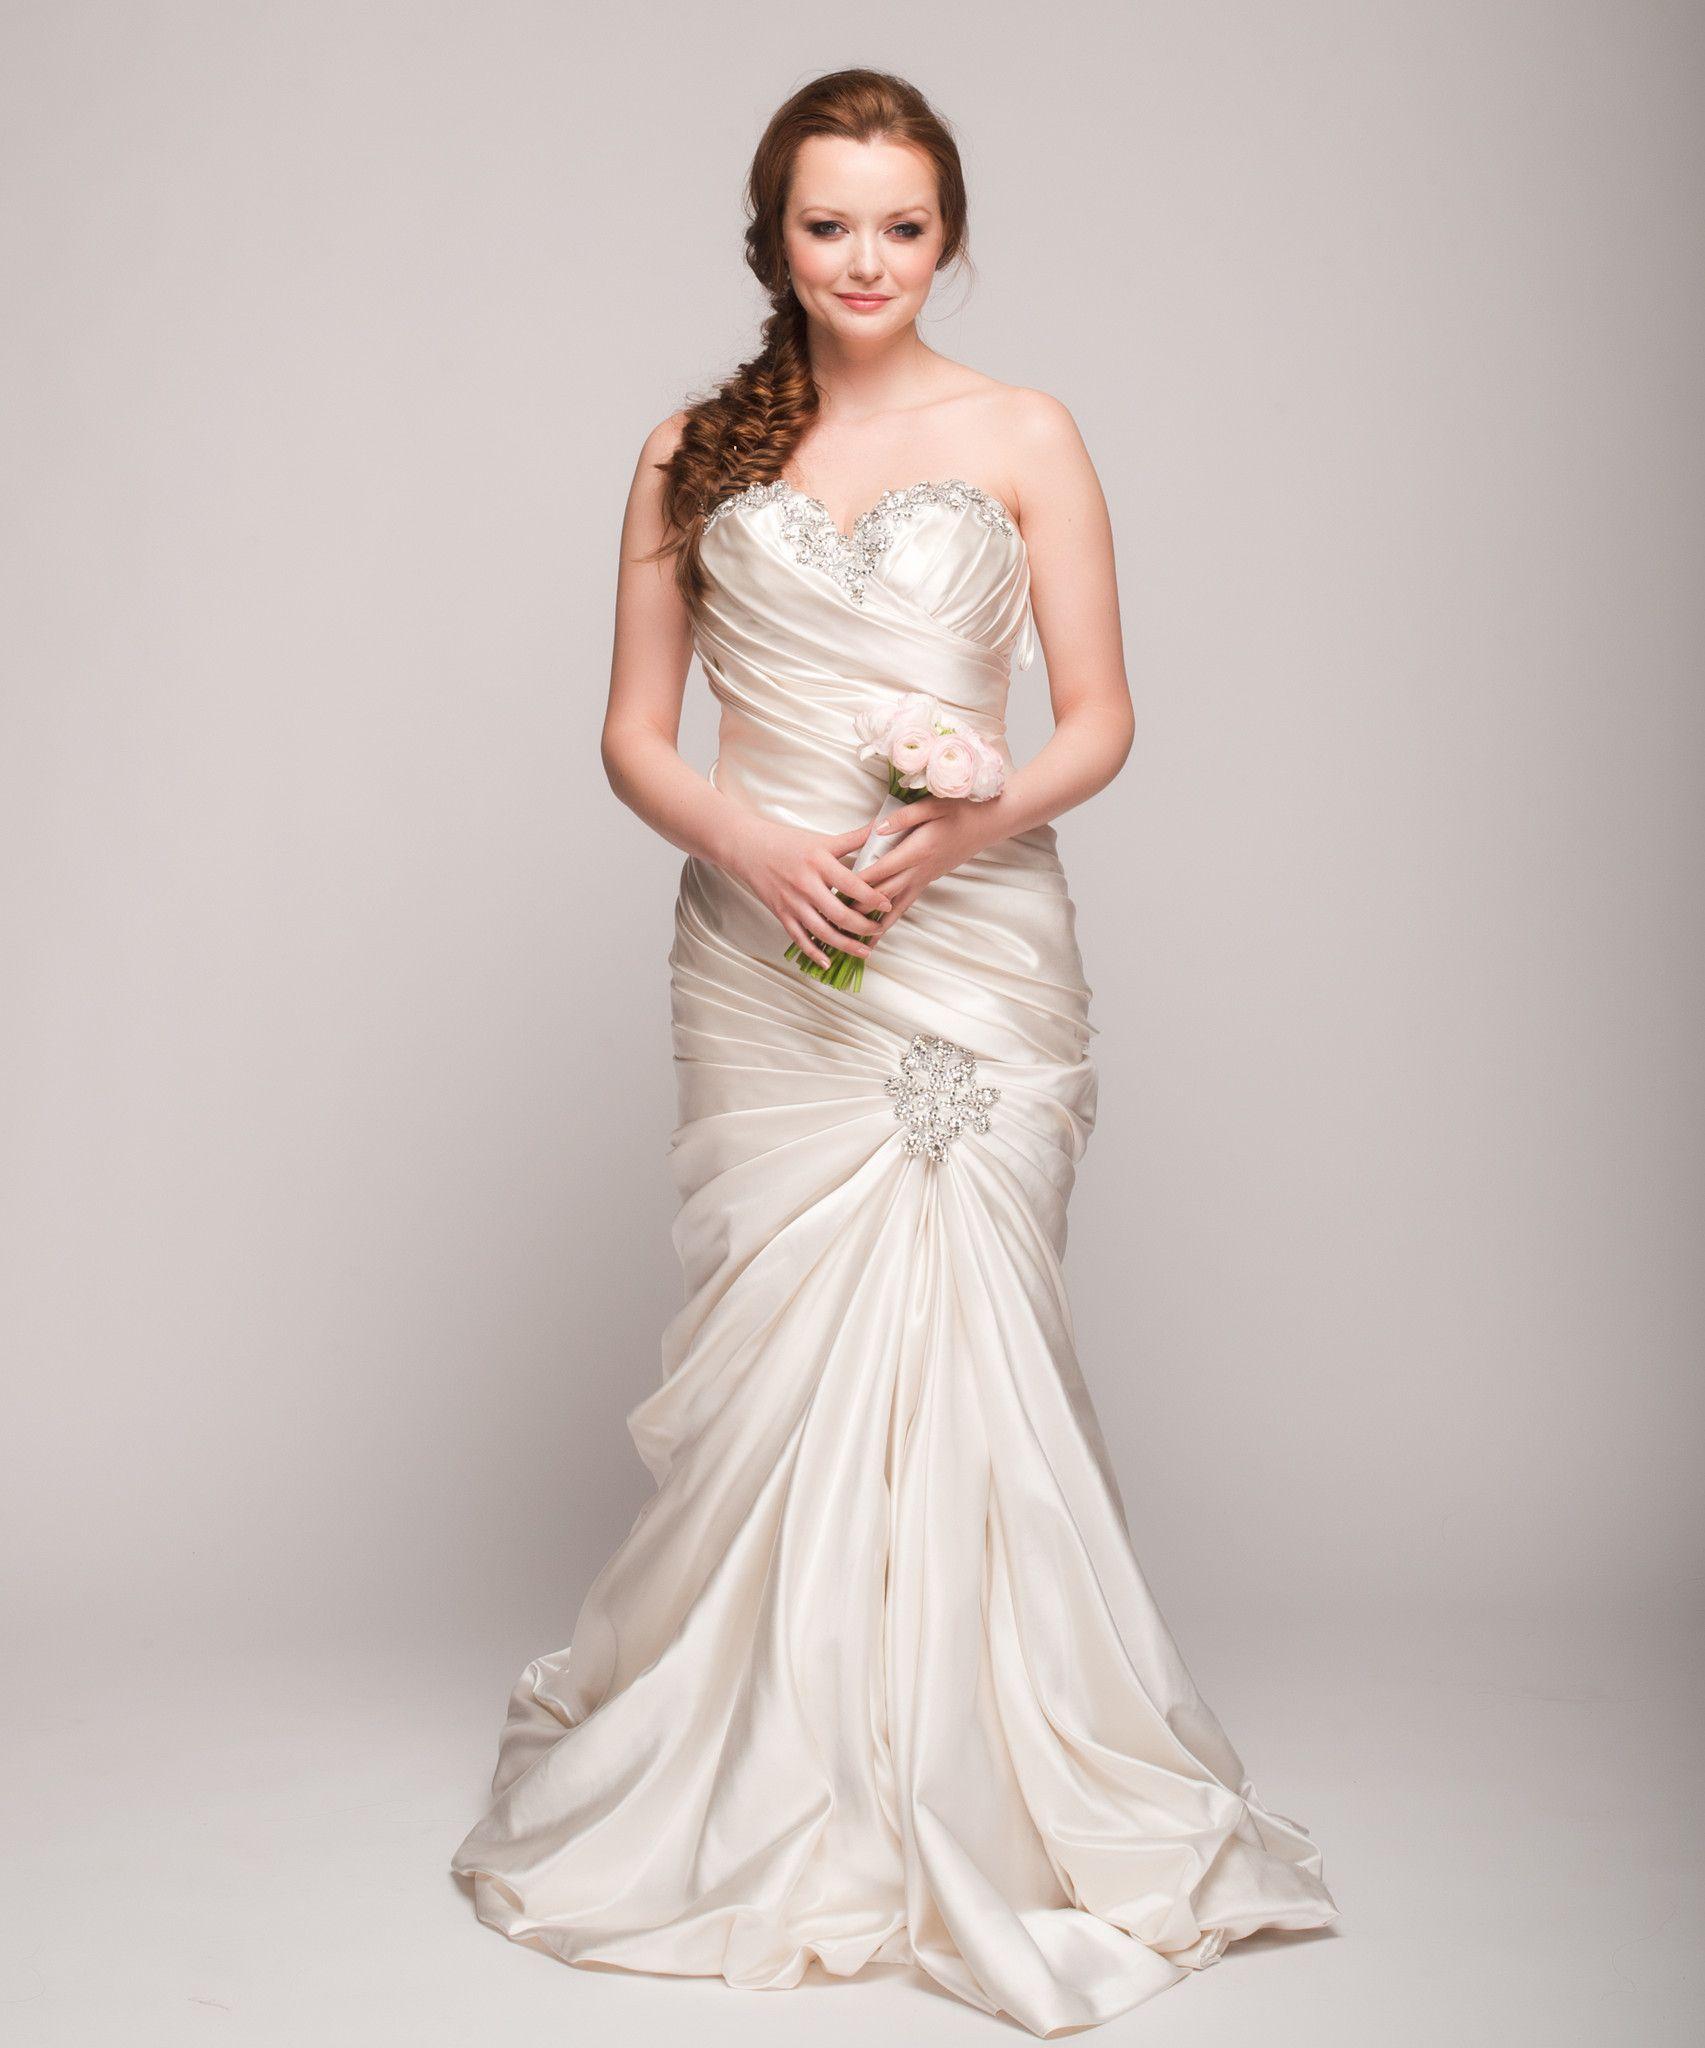 Pnina Tornai Ruched Mermaid Gown   Trajes bonitos, Vestidos novia y ...